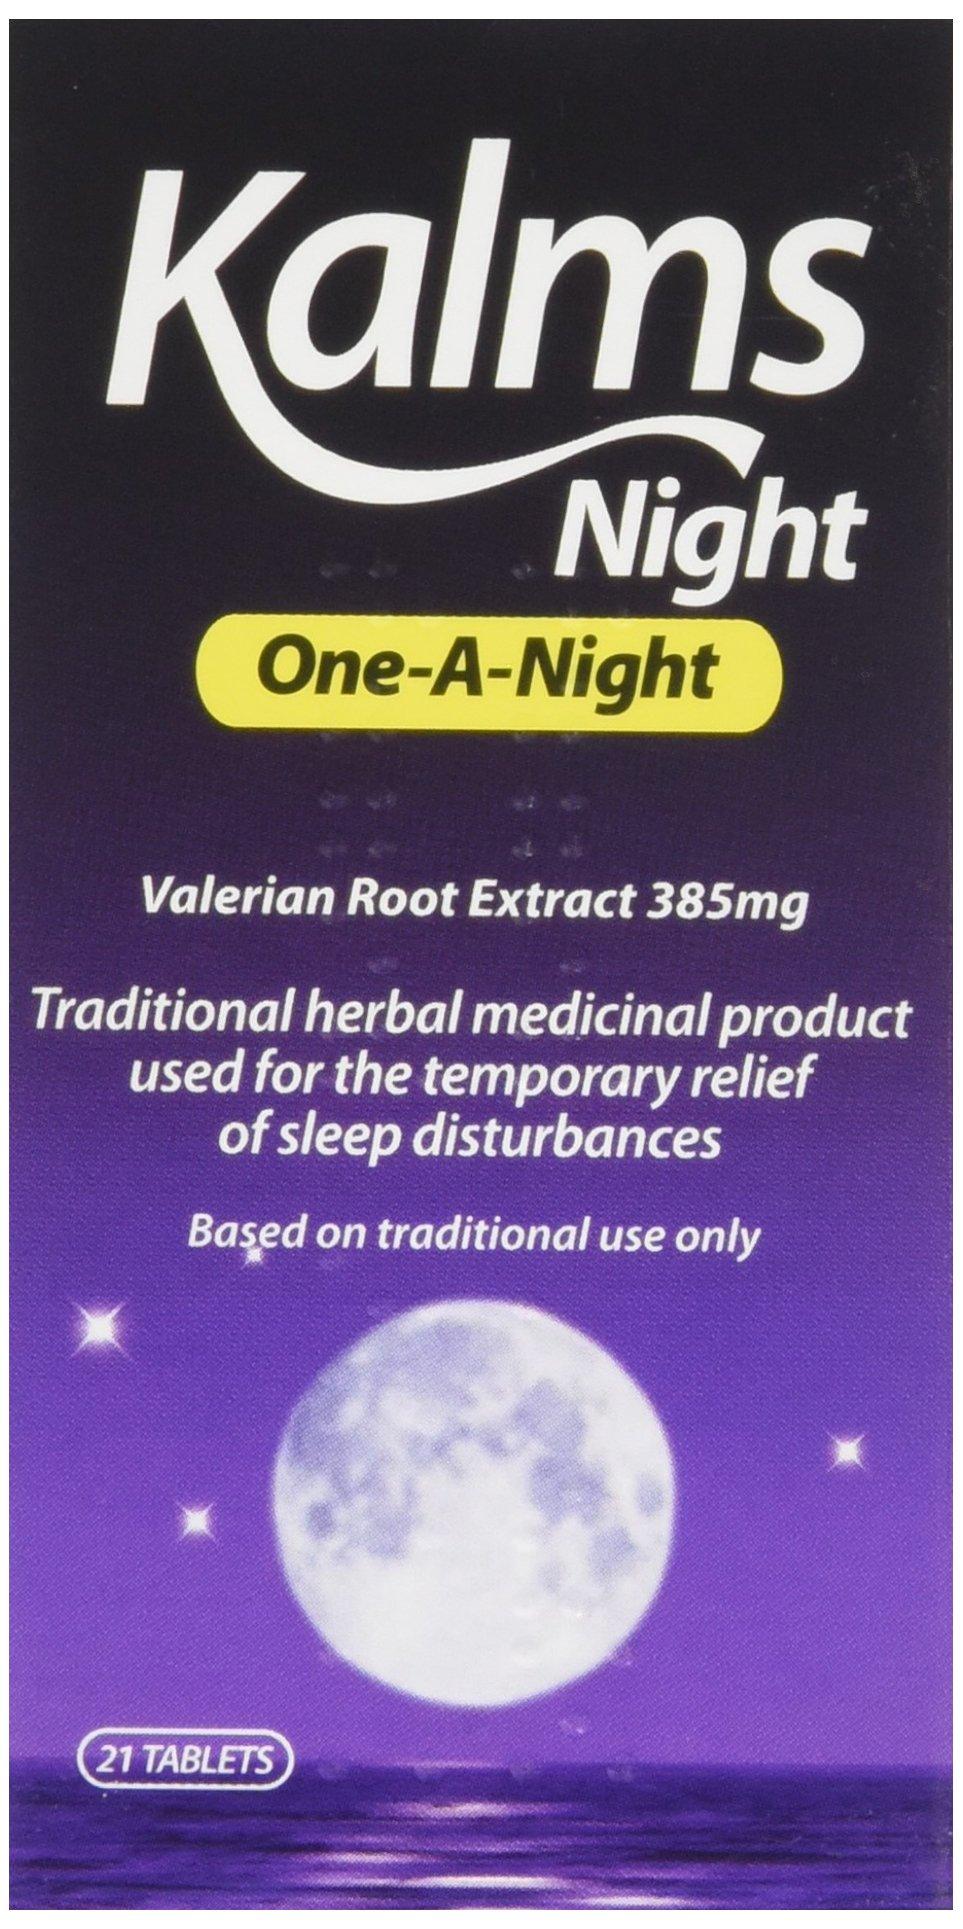 Kalms Night One-A-Night (21)